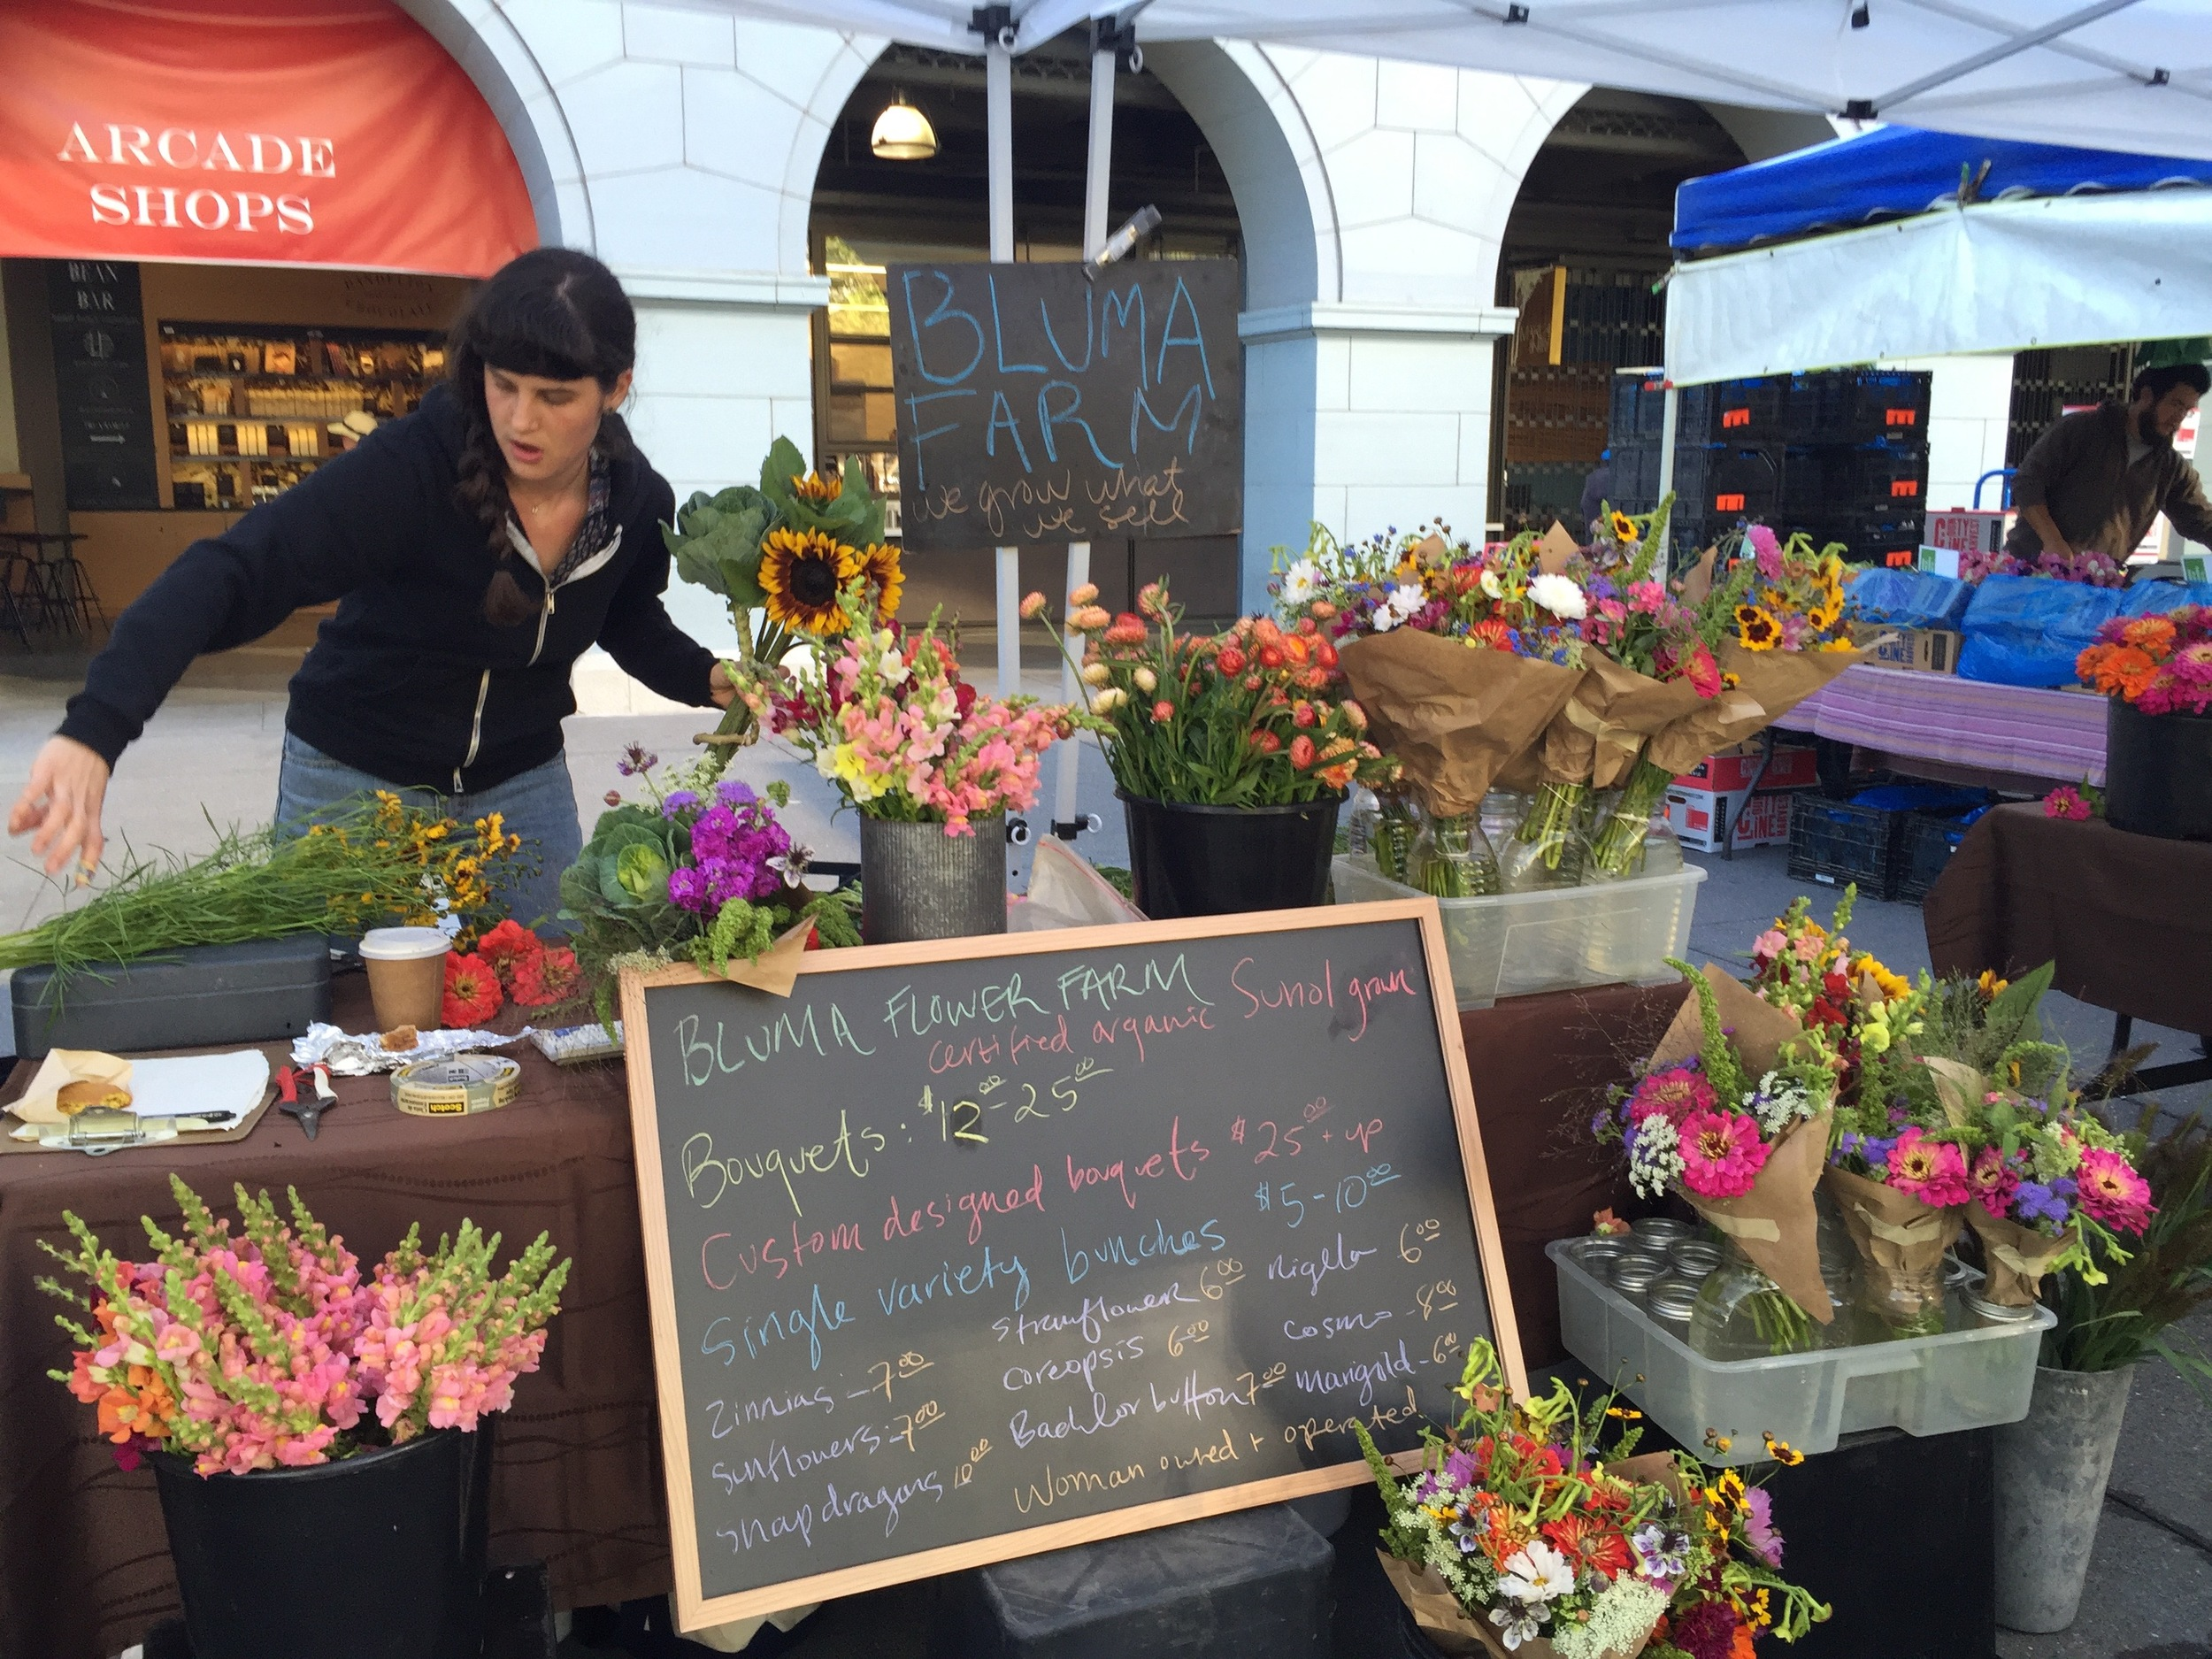 Bluma Farm: where I bought my flowers that day